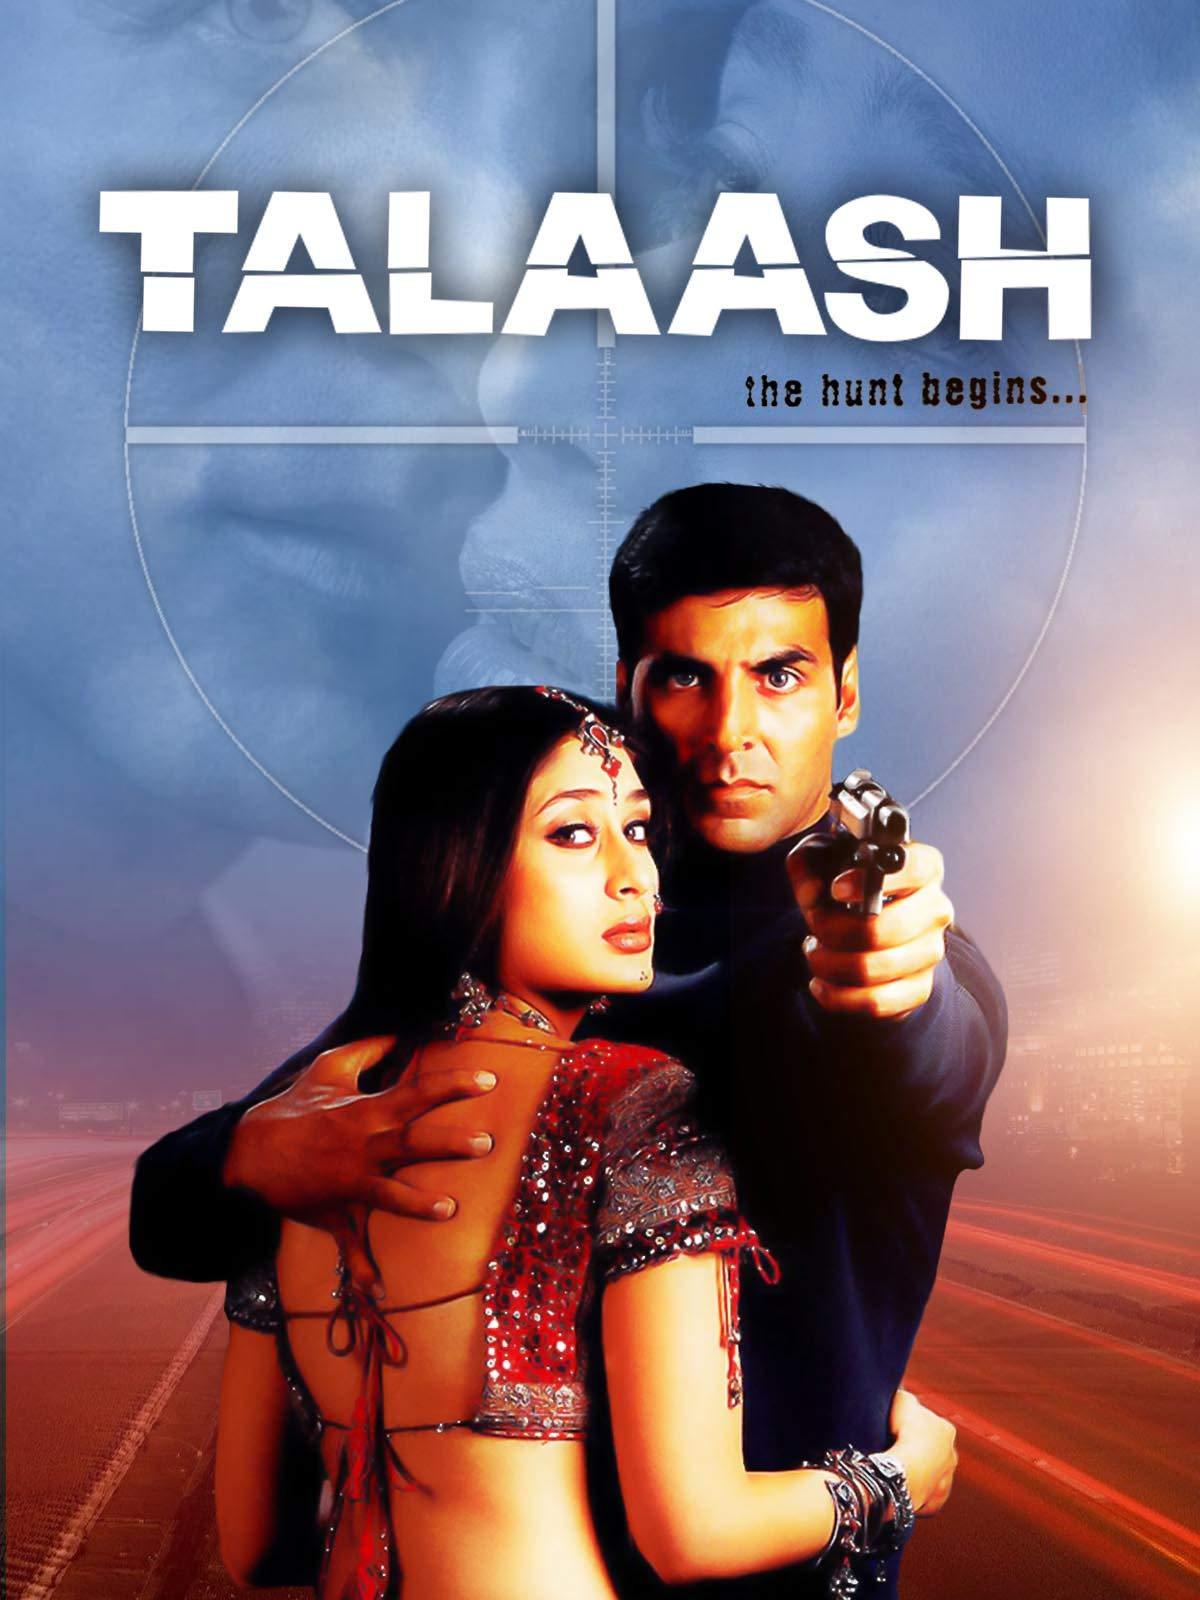 Talaash - The Hunt Begins